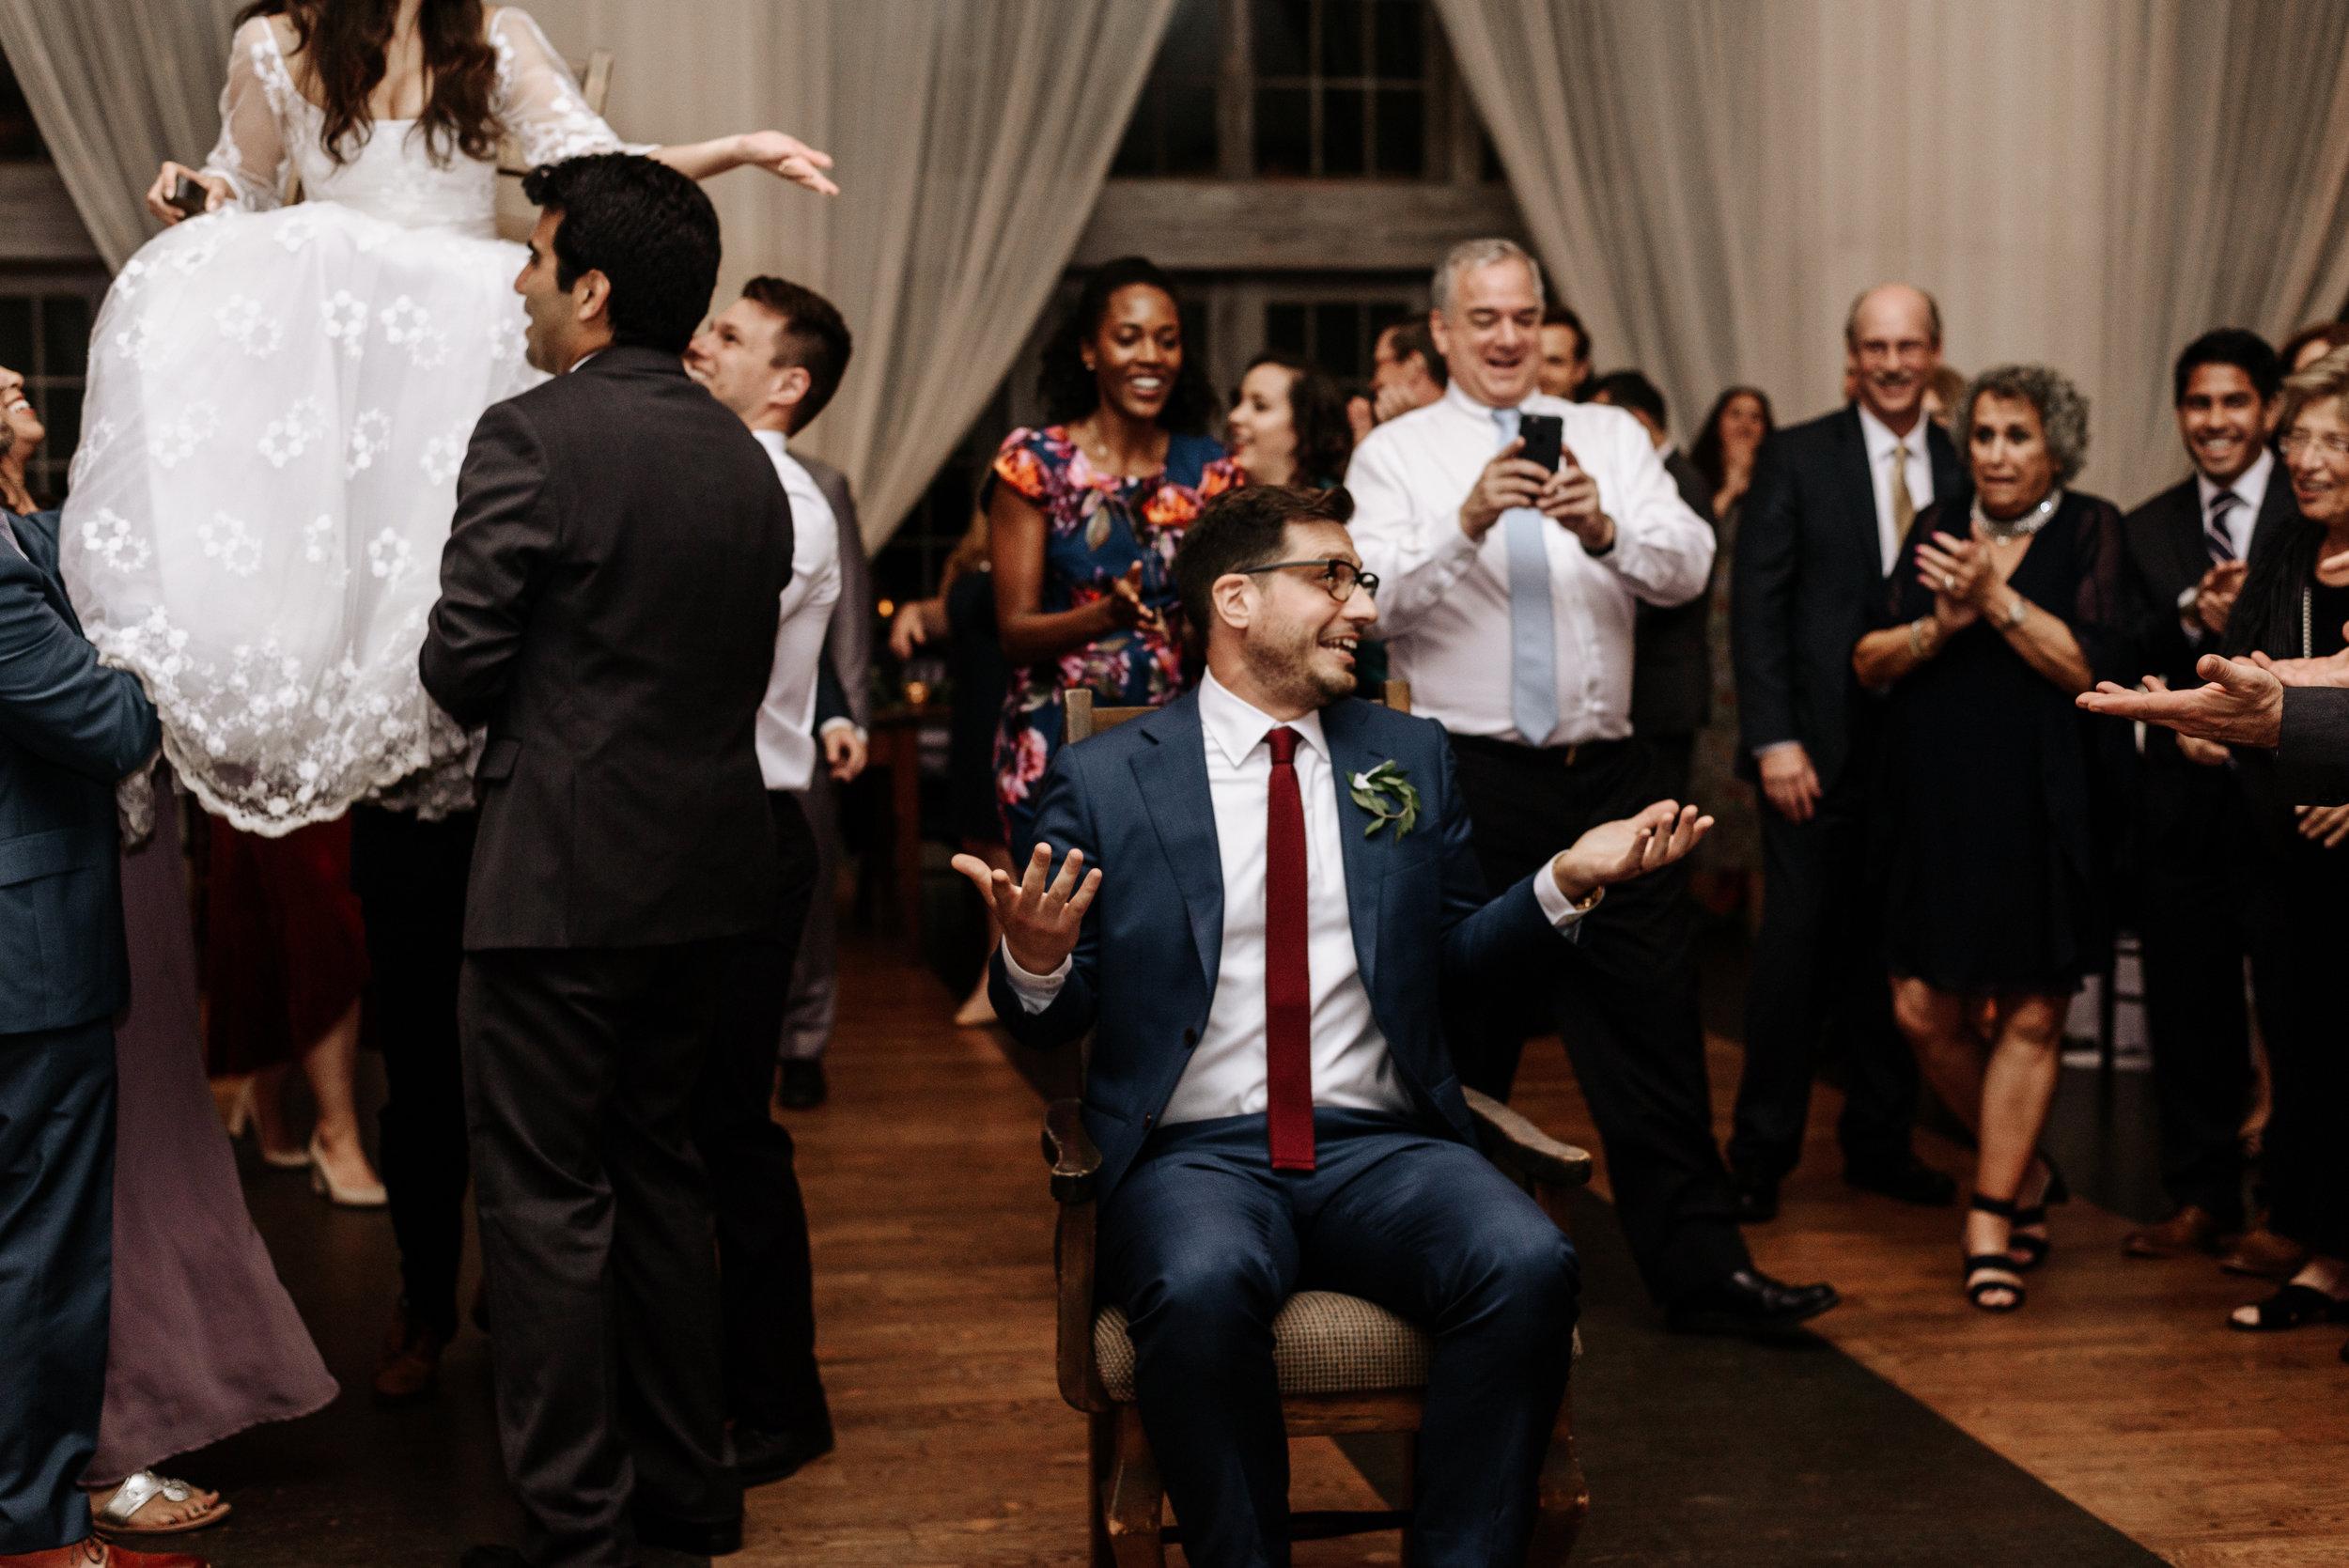 Veritas-Vineyards-and-Winery-Wedding-Photography-Afton-Virginia-Yasmin-Seth-Photography-by-V-3268.jpg